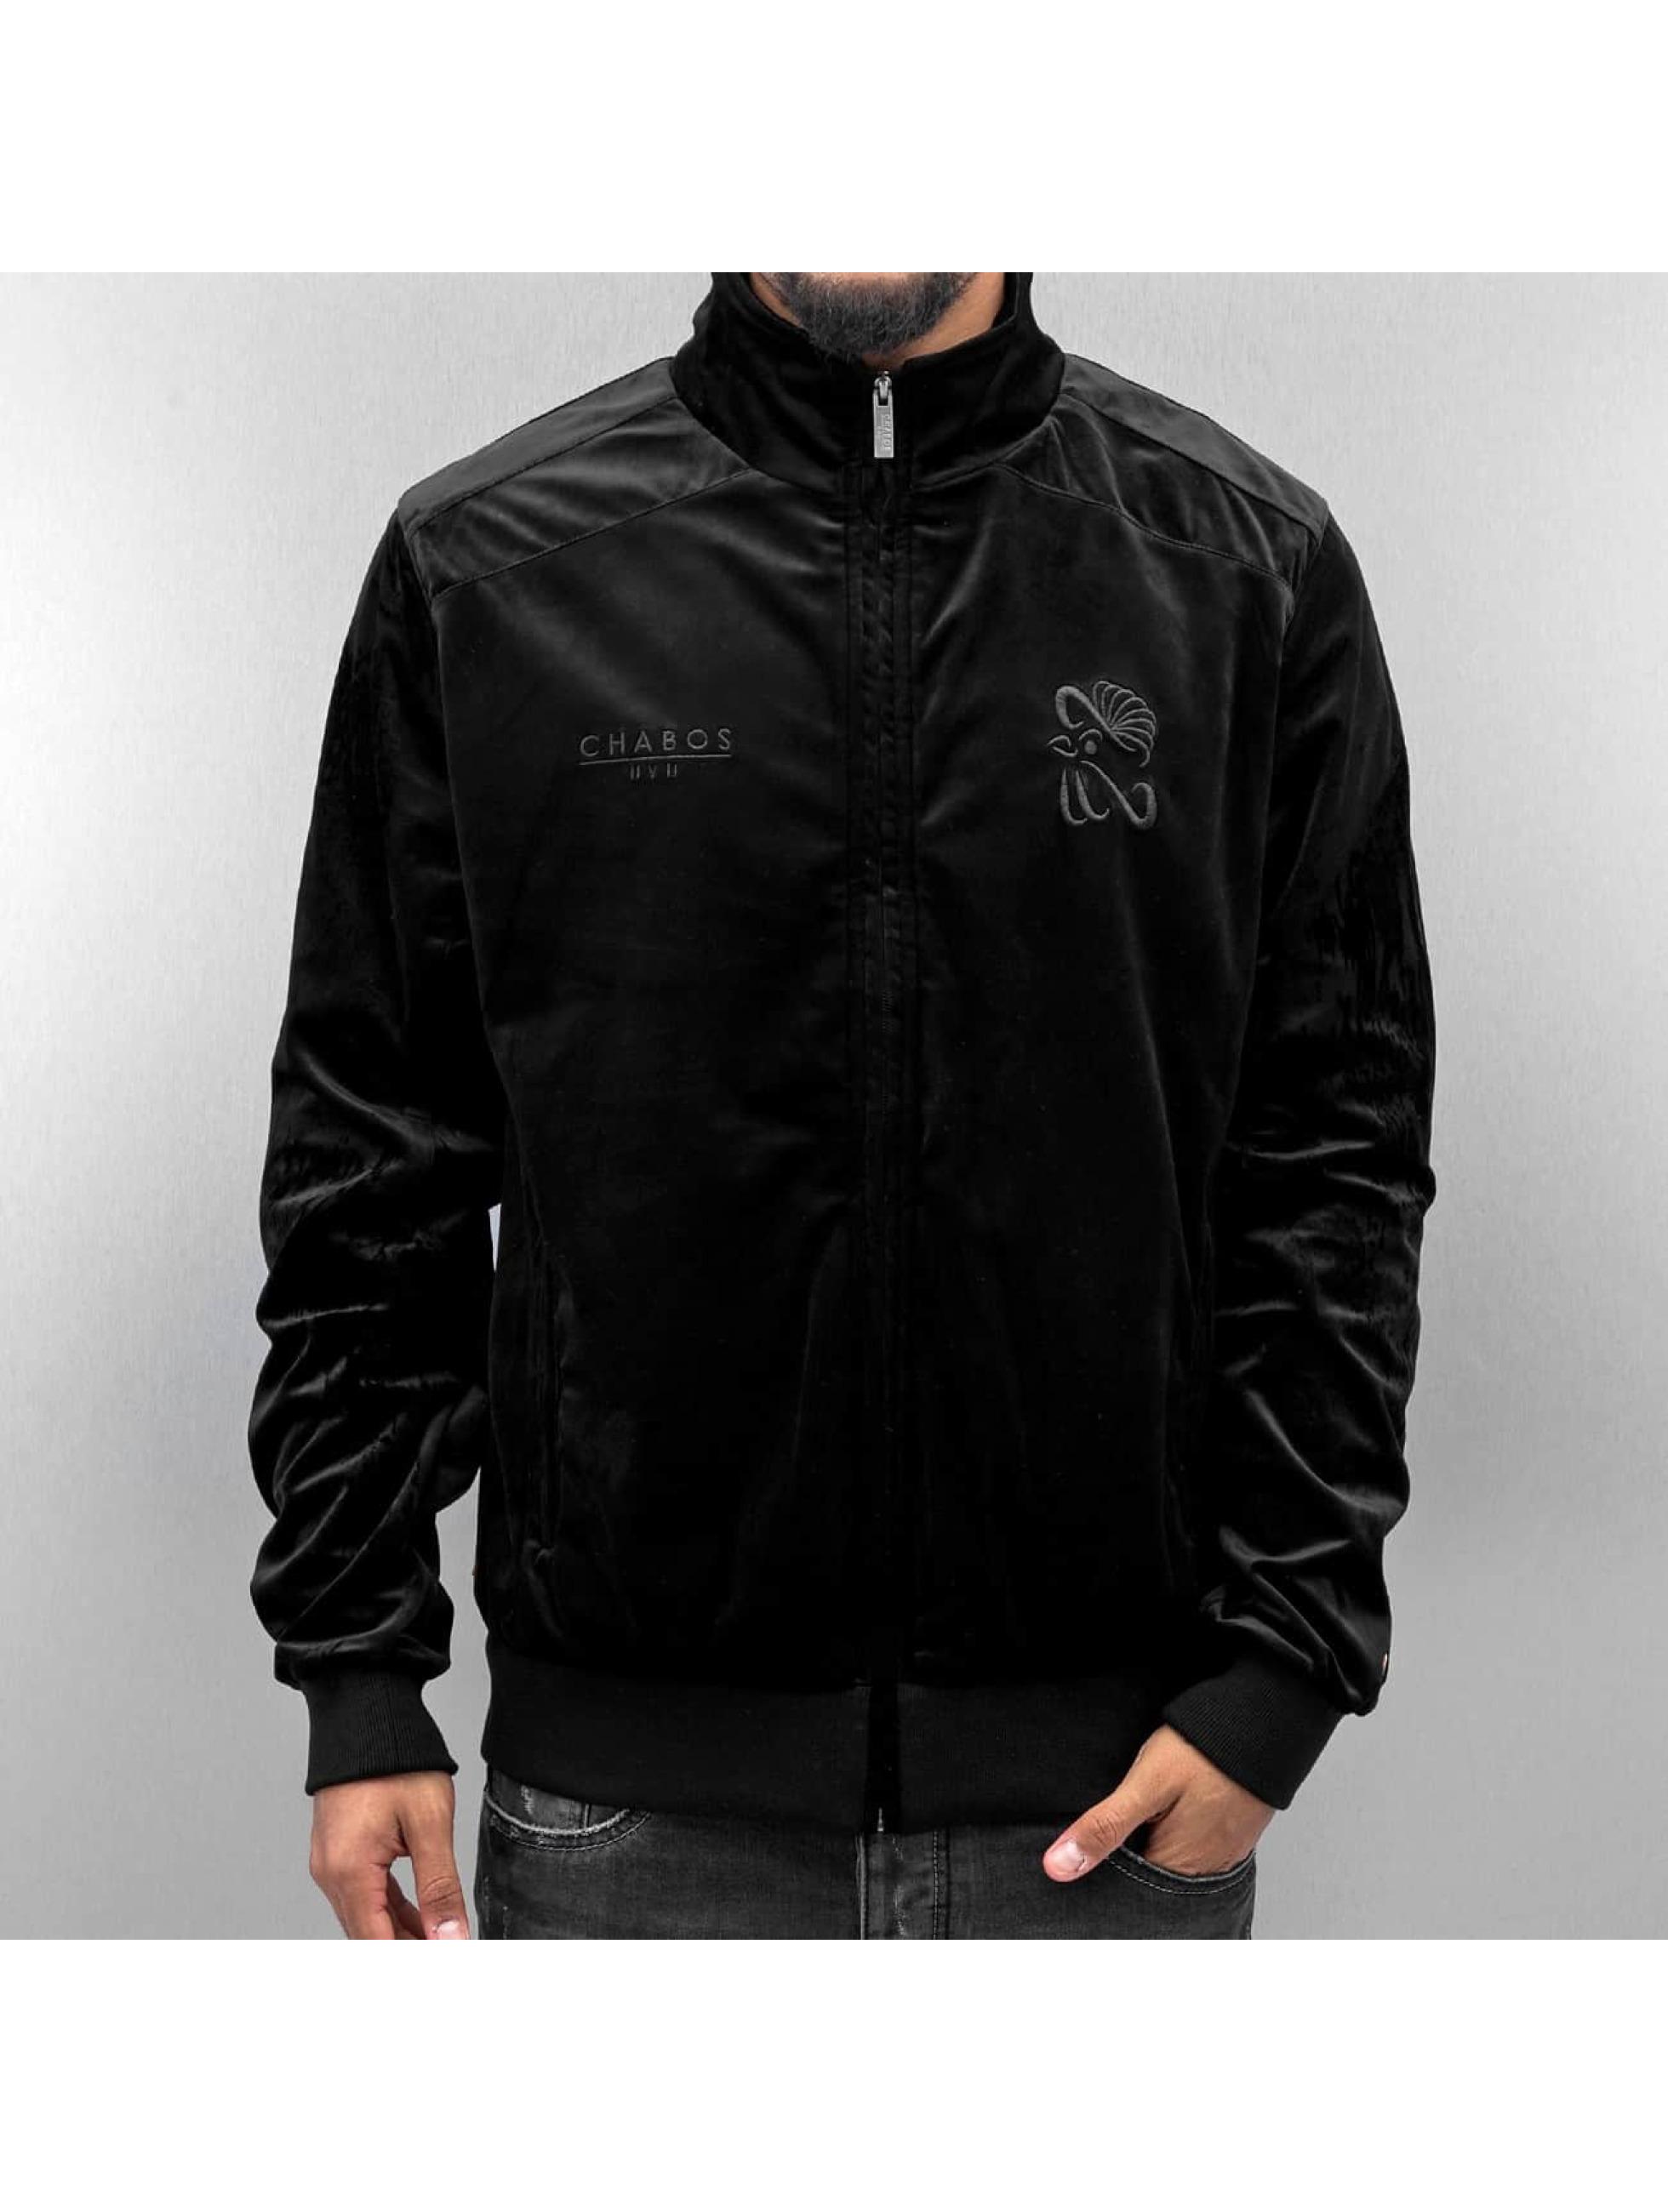 CHABOS IIVII Lightweight Jacket Core Velour Samt black